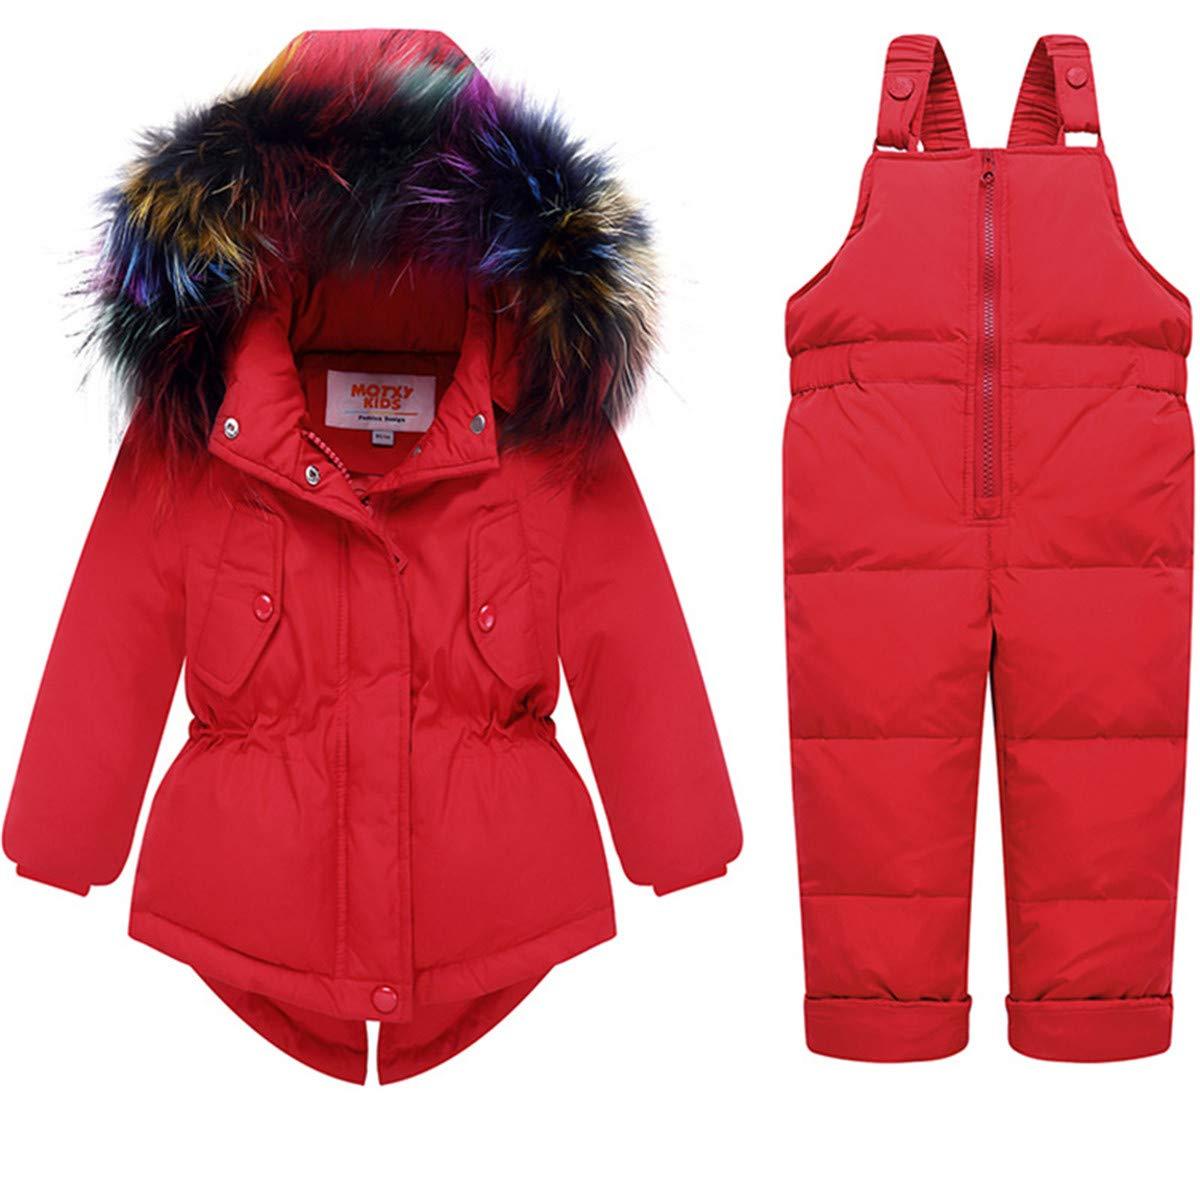 REWANGOING 2 Pcs Baby Kids Girls Winter Warm Colorful Fur Trim Puffer Down Jacket Snowsuit with Ski Bib Pants Set 2-3 Years by REWANGOING